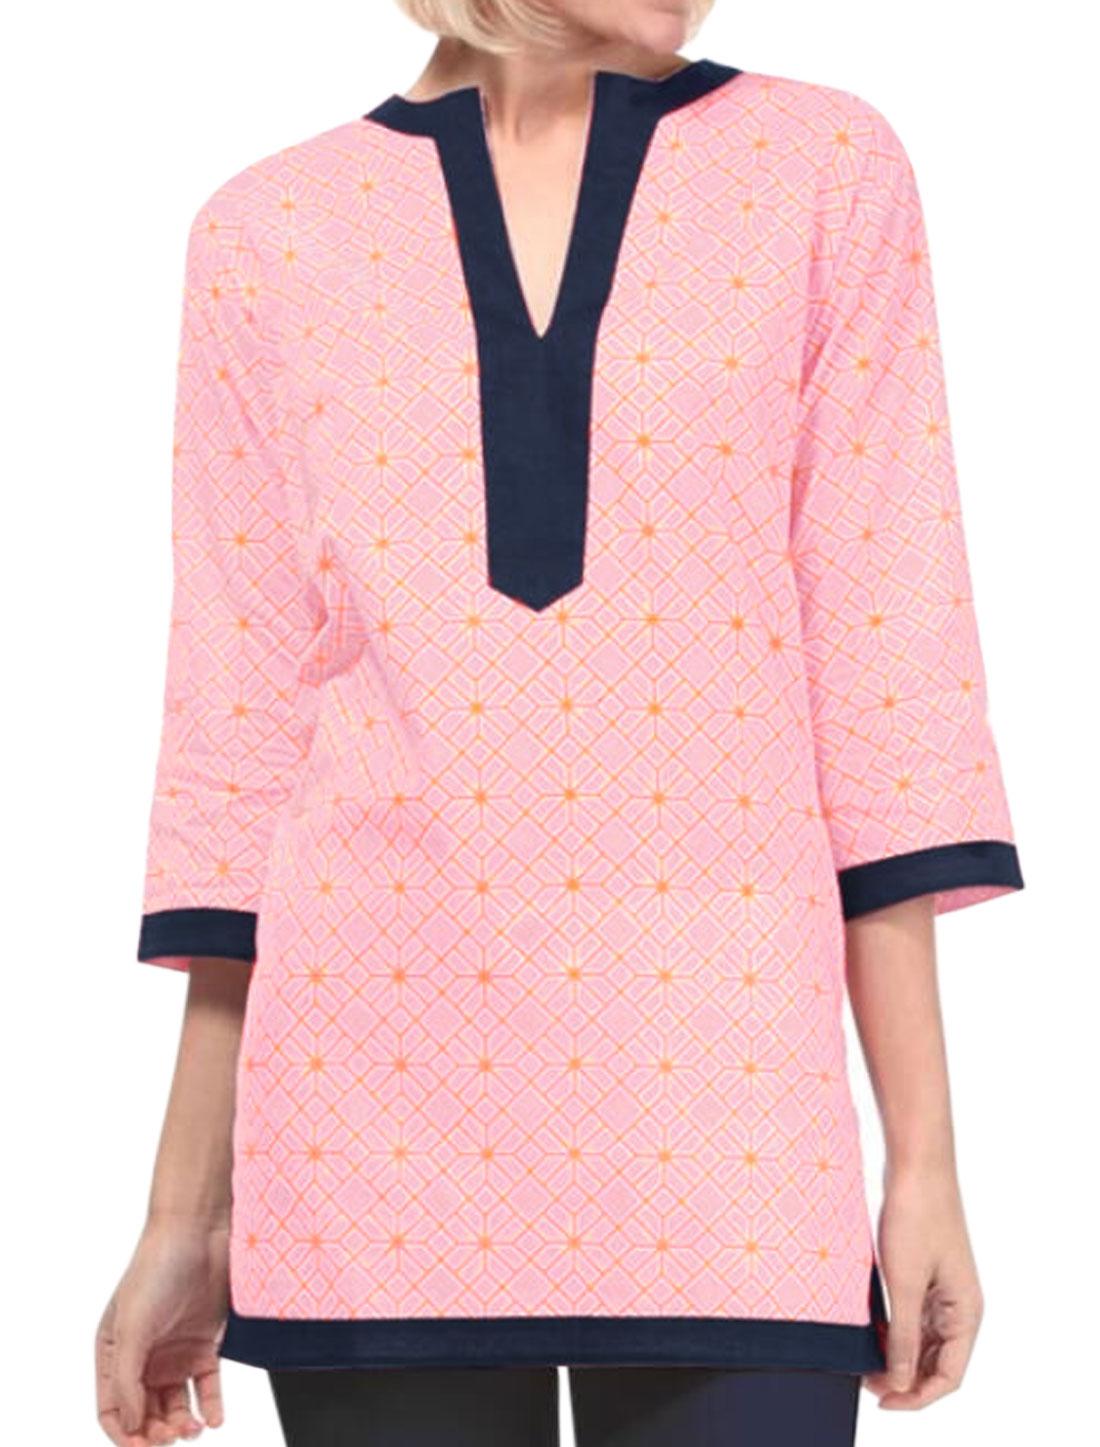 Women Geometric Prints Split Neck Contrast Color Tunic Top Pink M